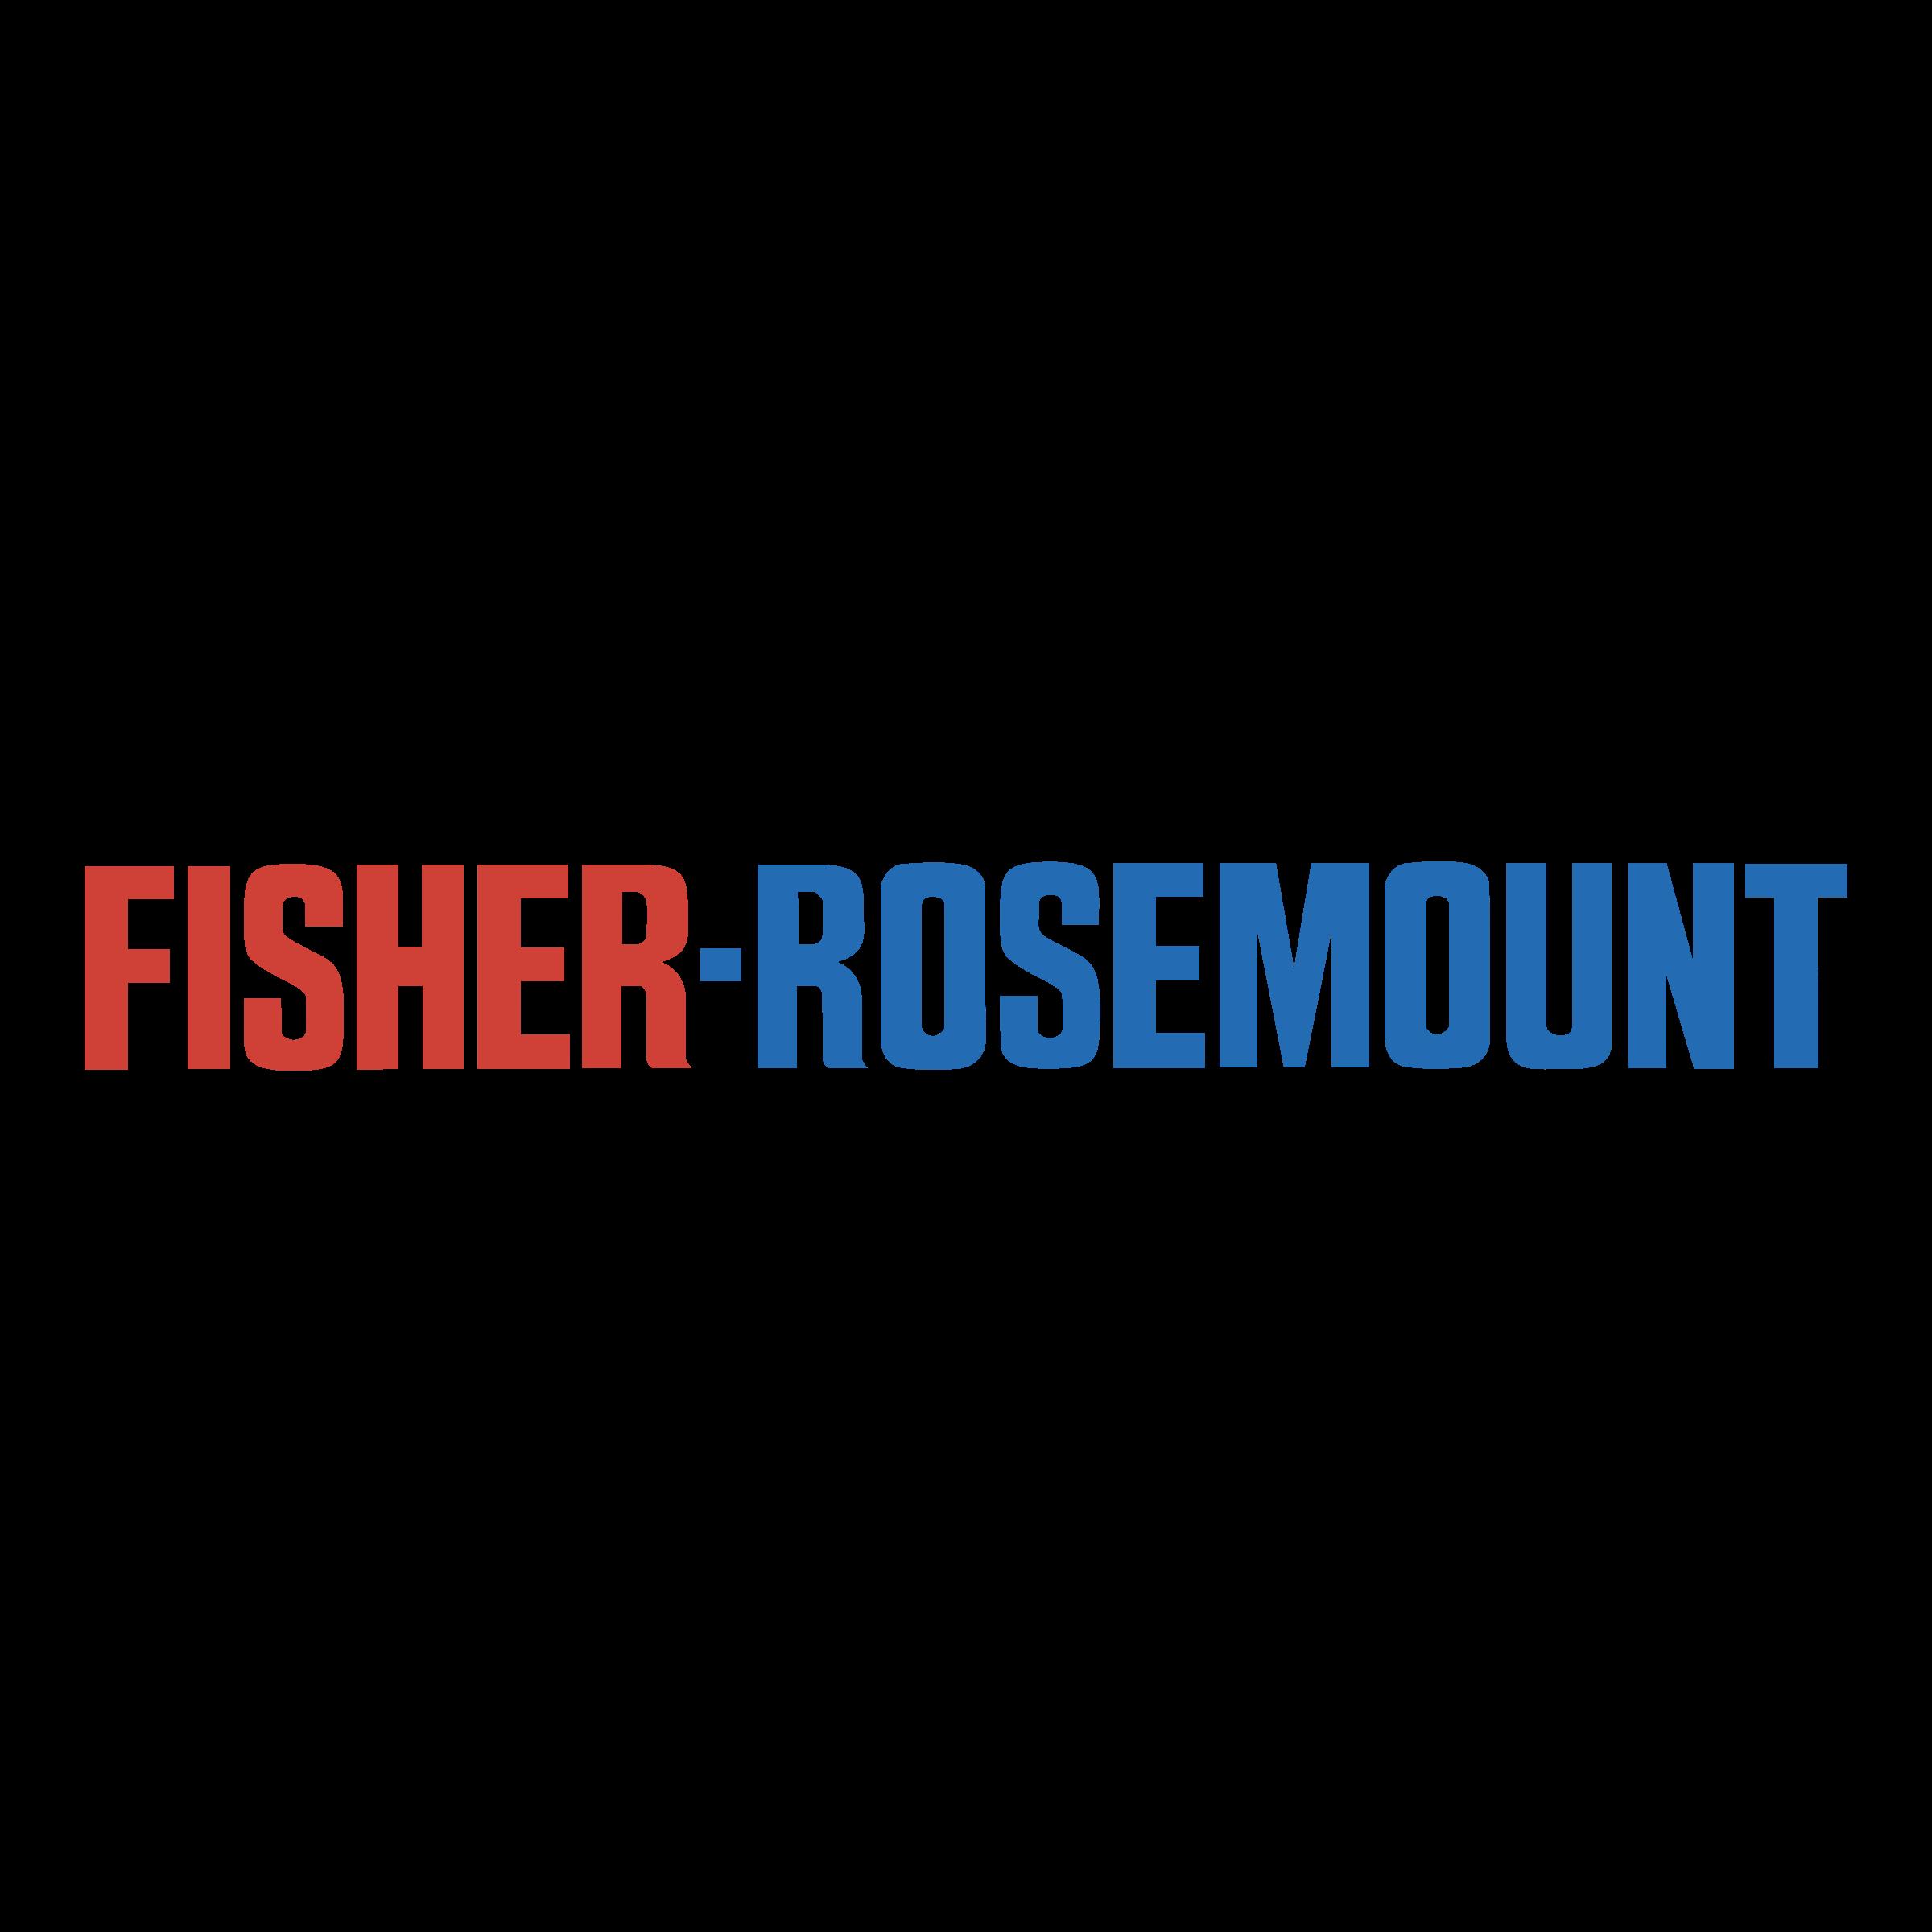 Fisher-Rosemount